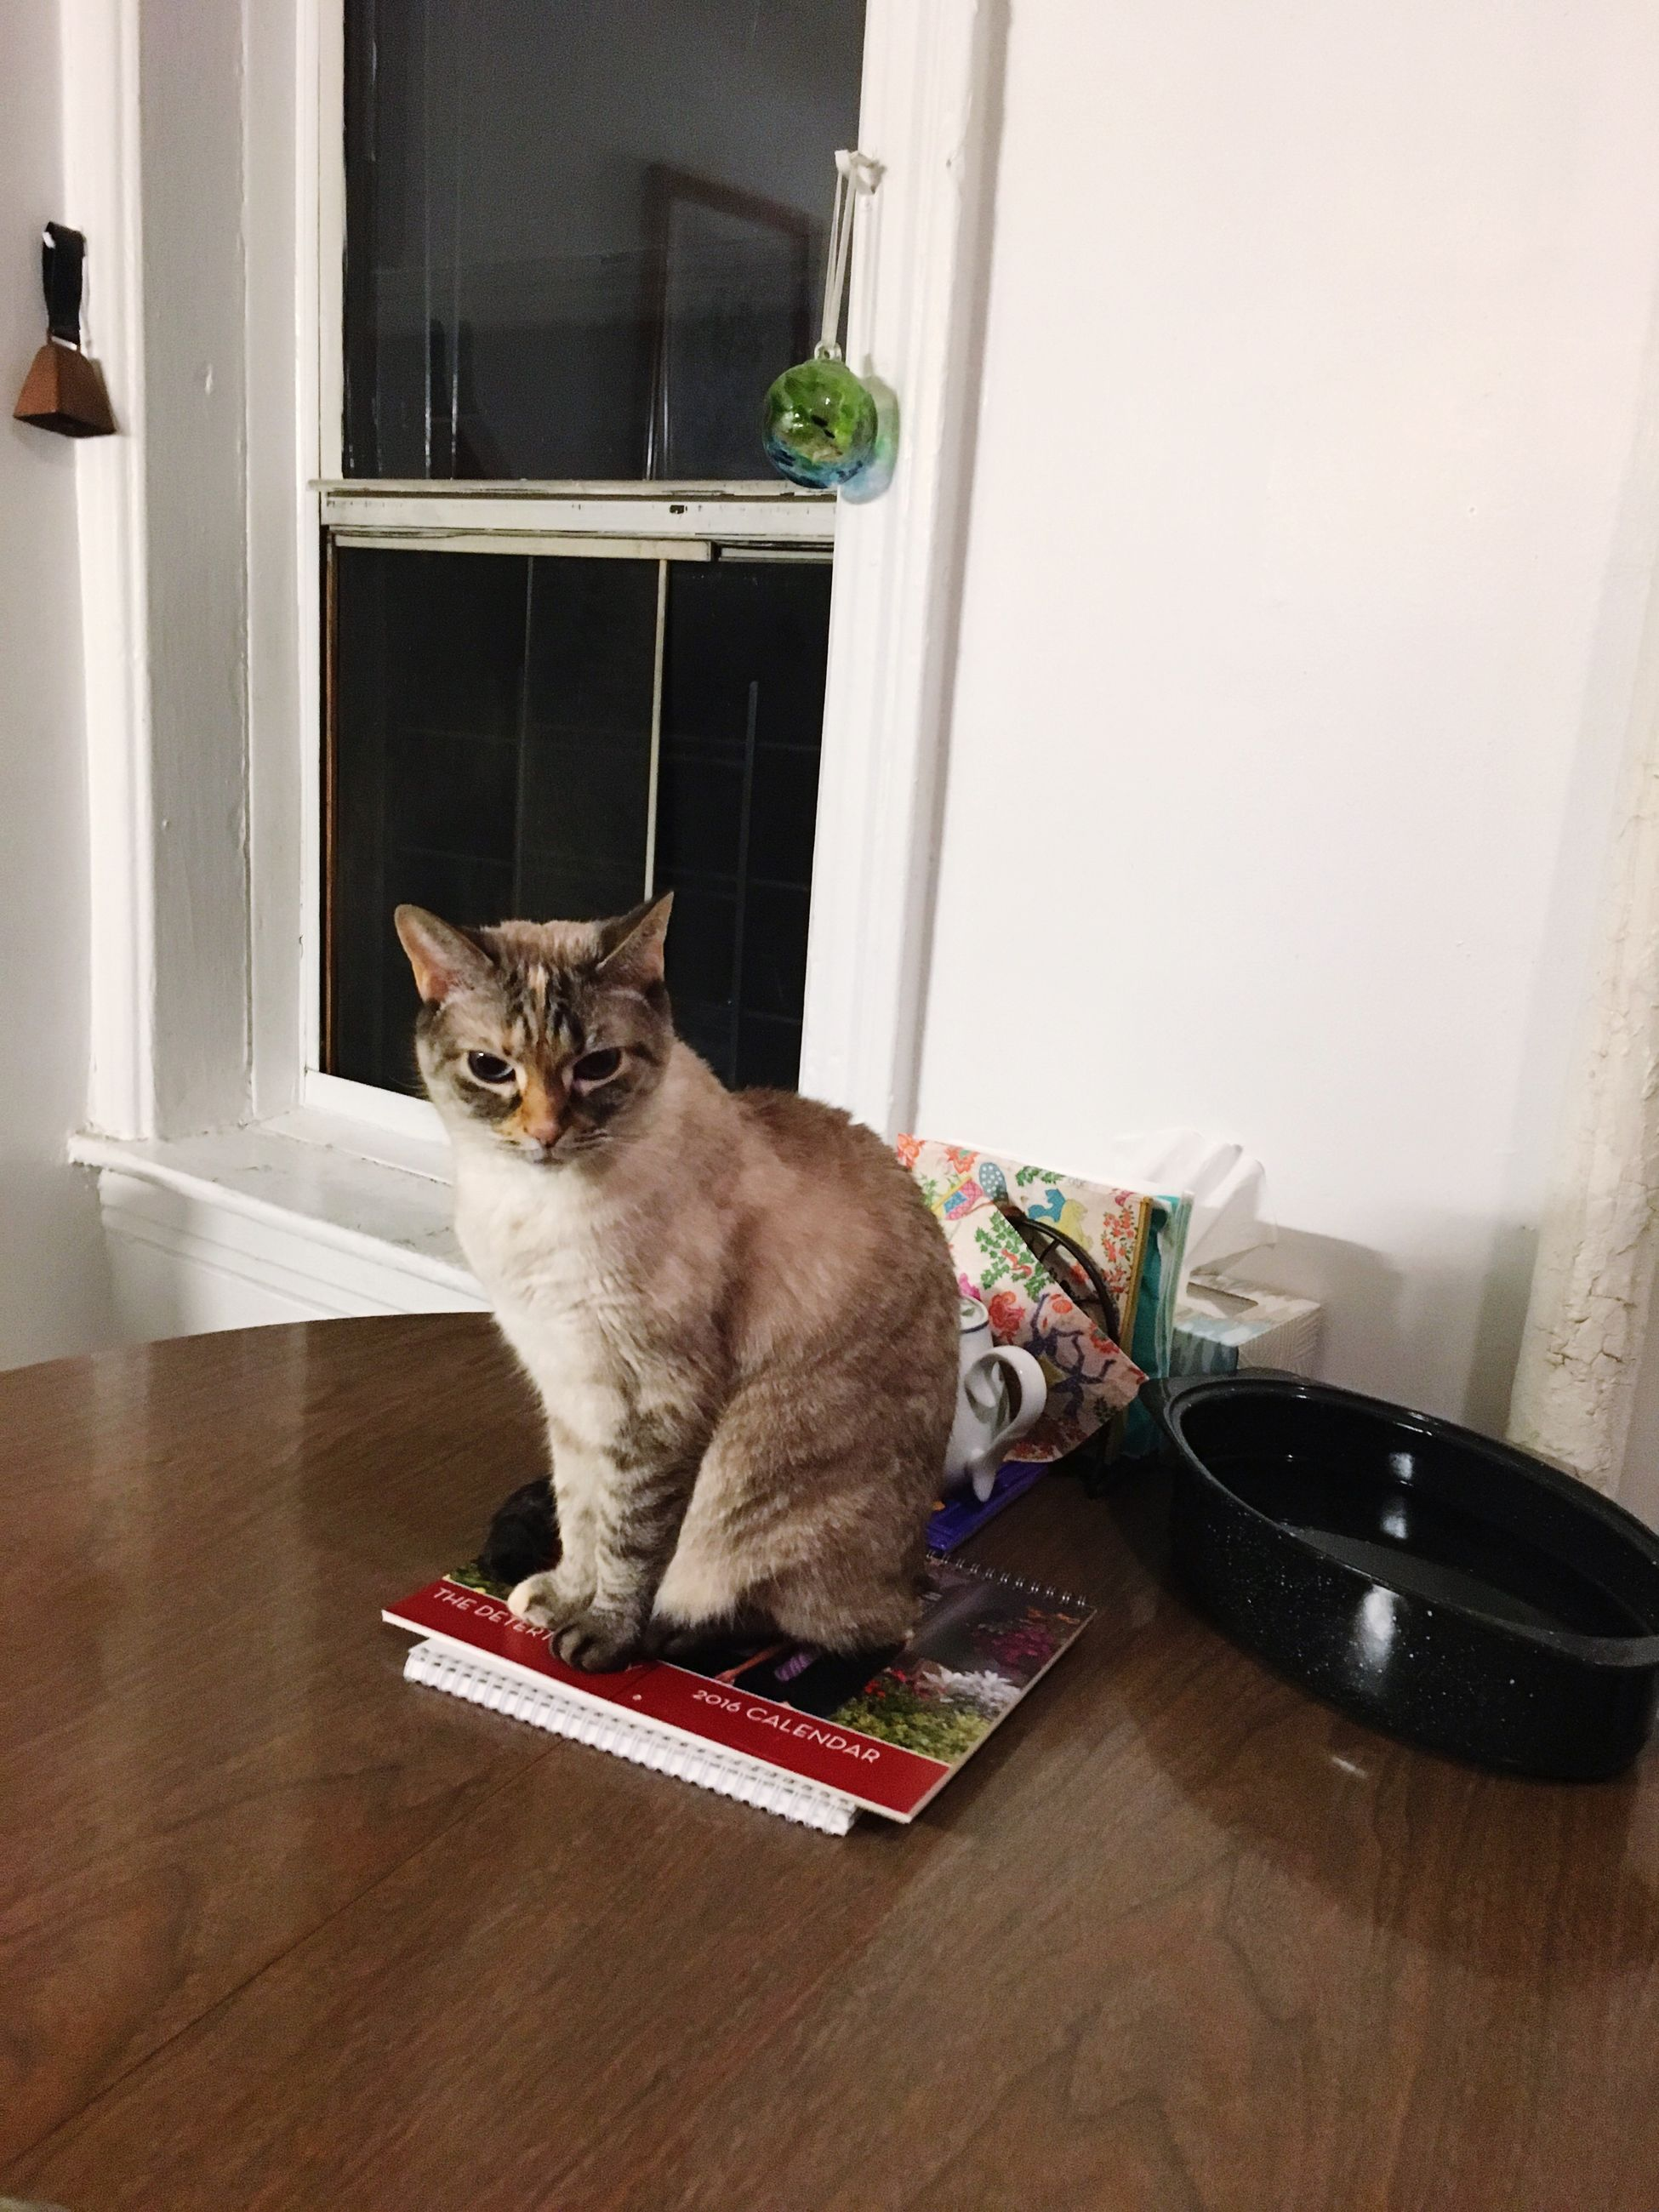 domestic cat, pets, one animal, domestic animals, animal themes, window, mammal, feline, window sill, full length, day, no people, portrait, outdoors, ajar